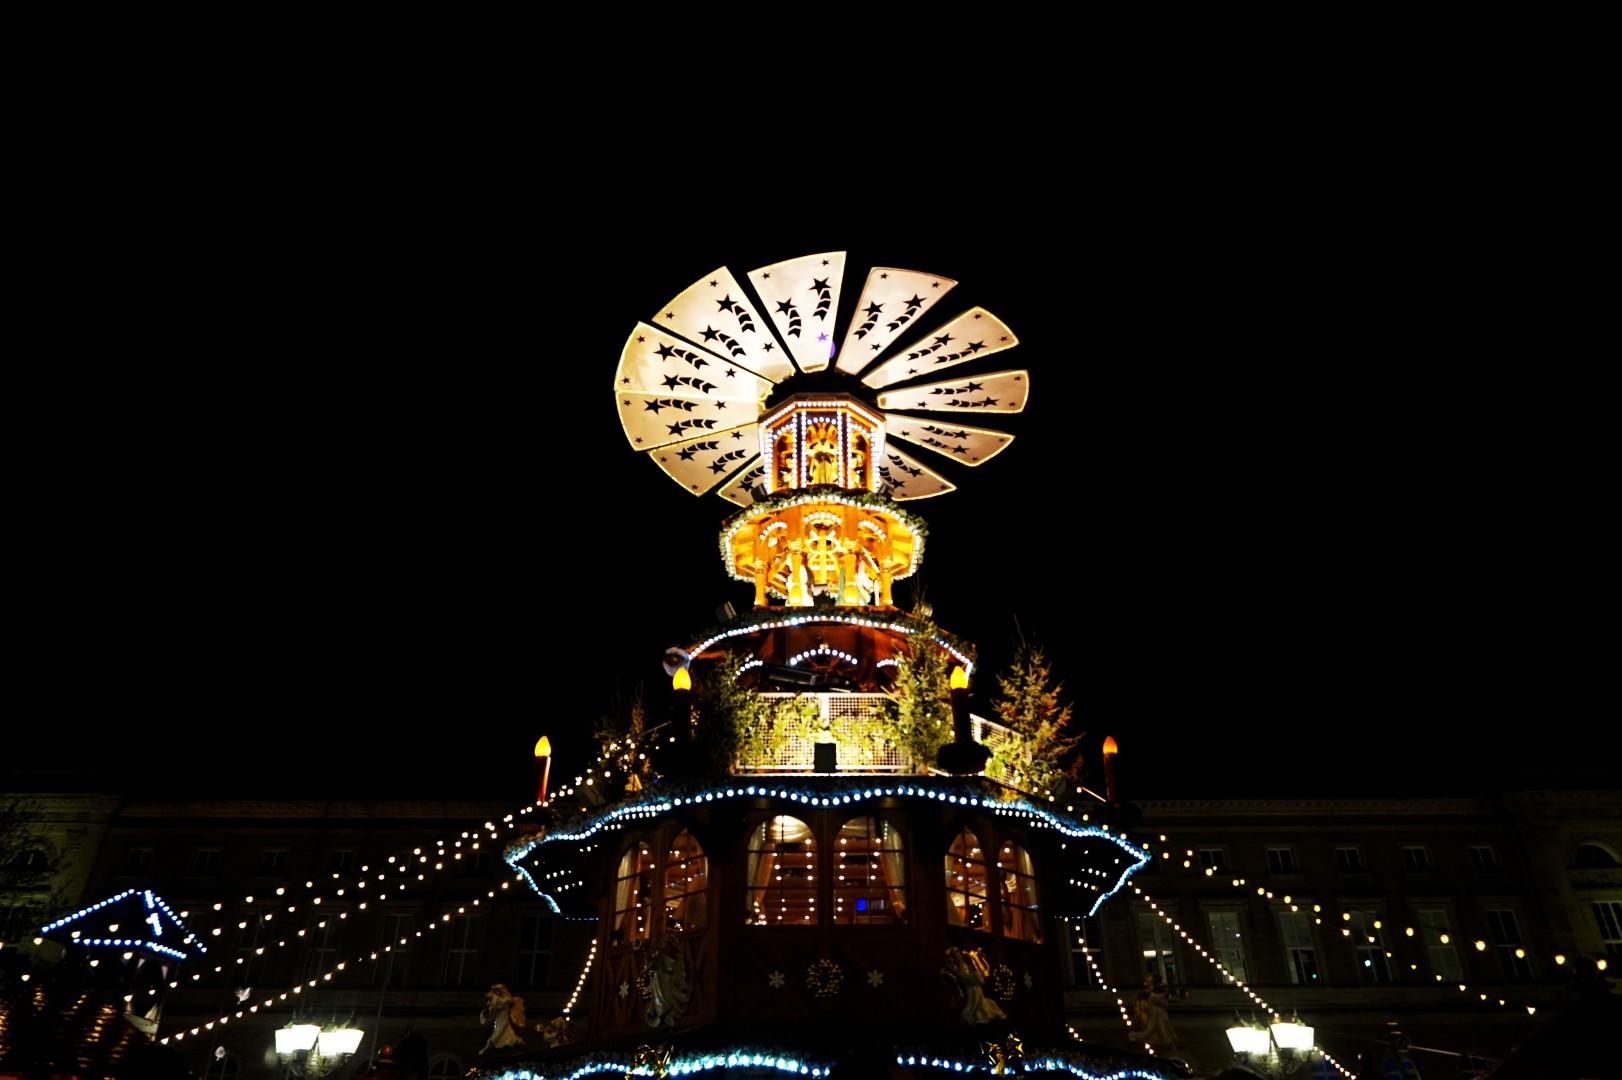 Karlsruhe - Le Marché de Noël